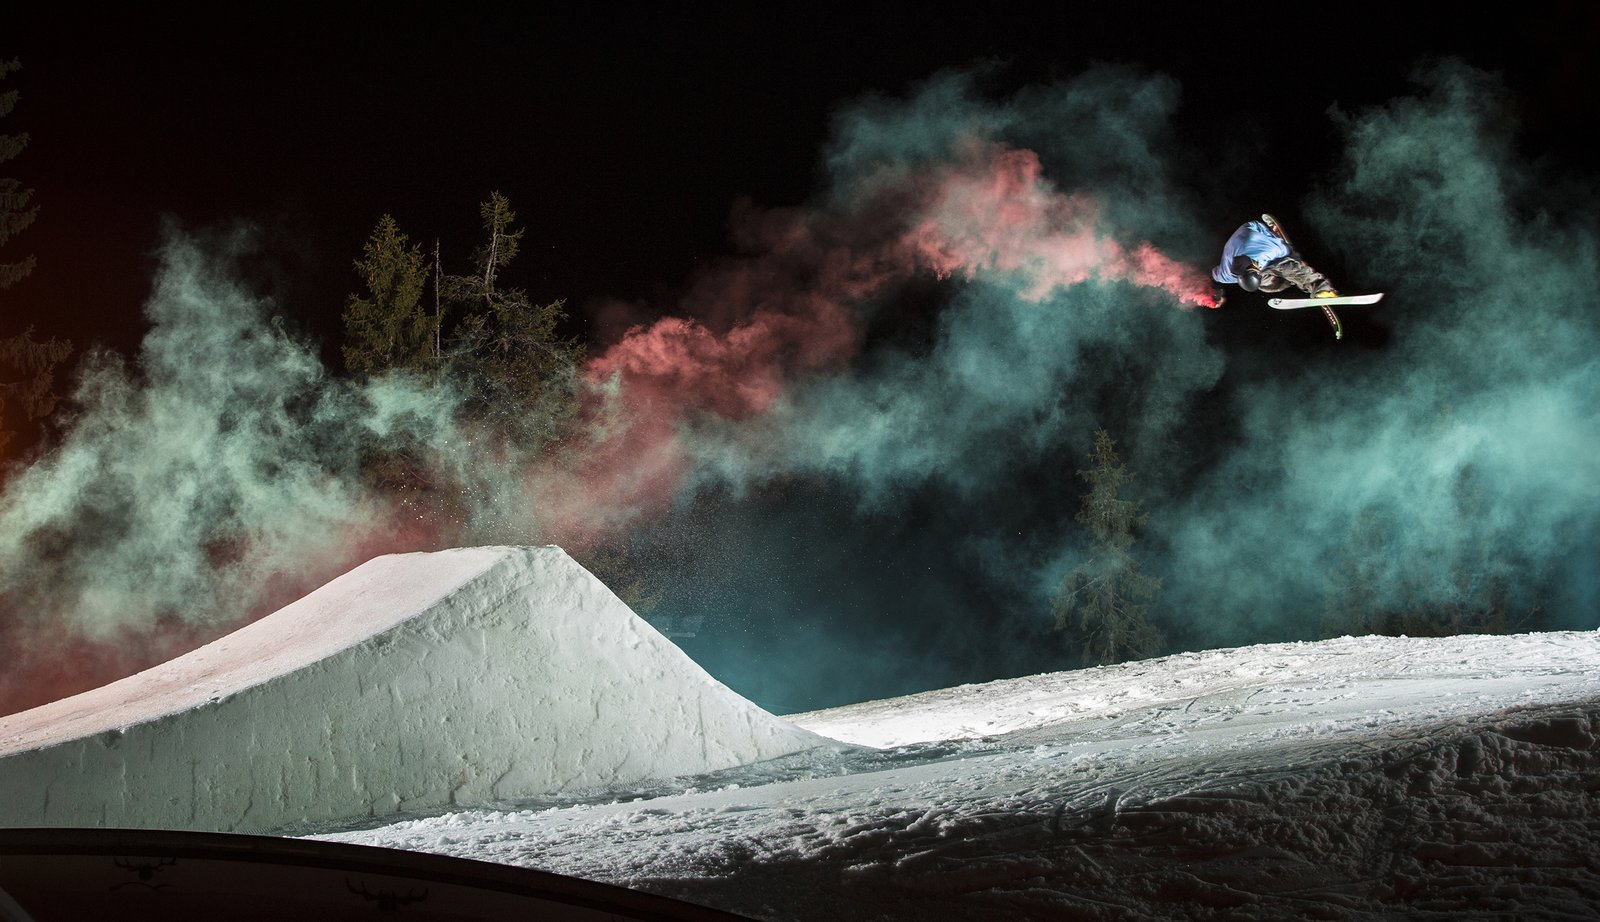 Kevin Salonius Smoke flare shoot